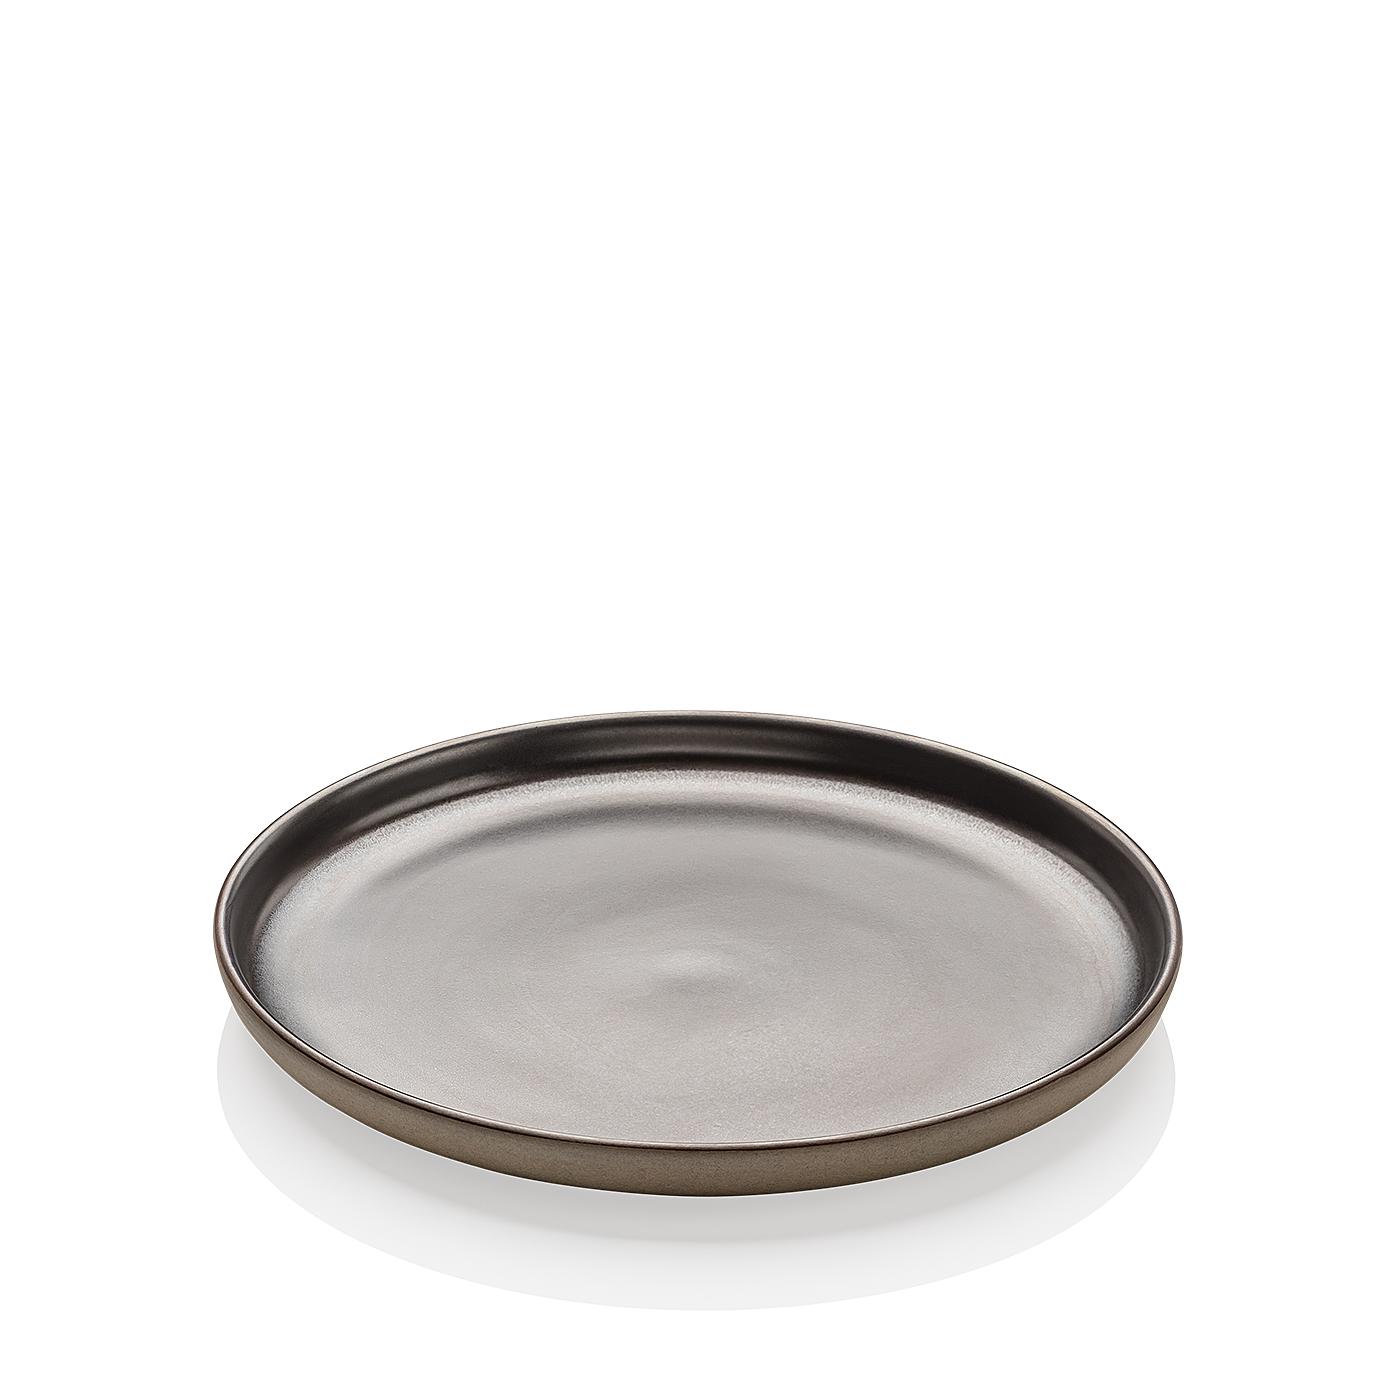 Gourmetteller 26 cm Joyn Stoneware Iron Arzberg